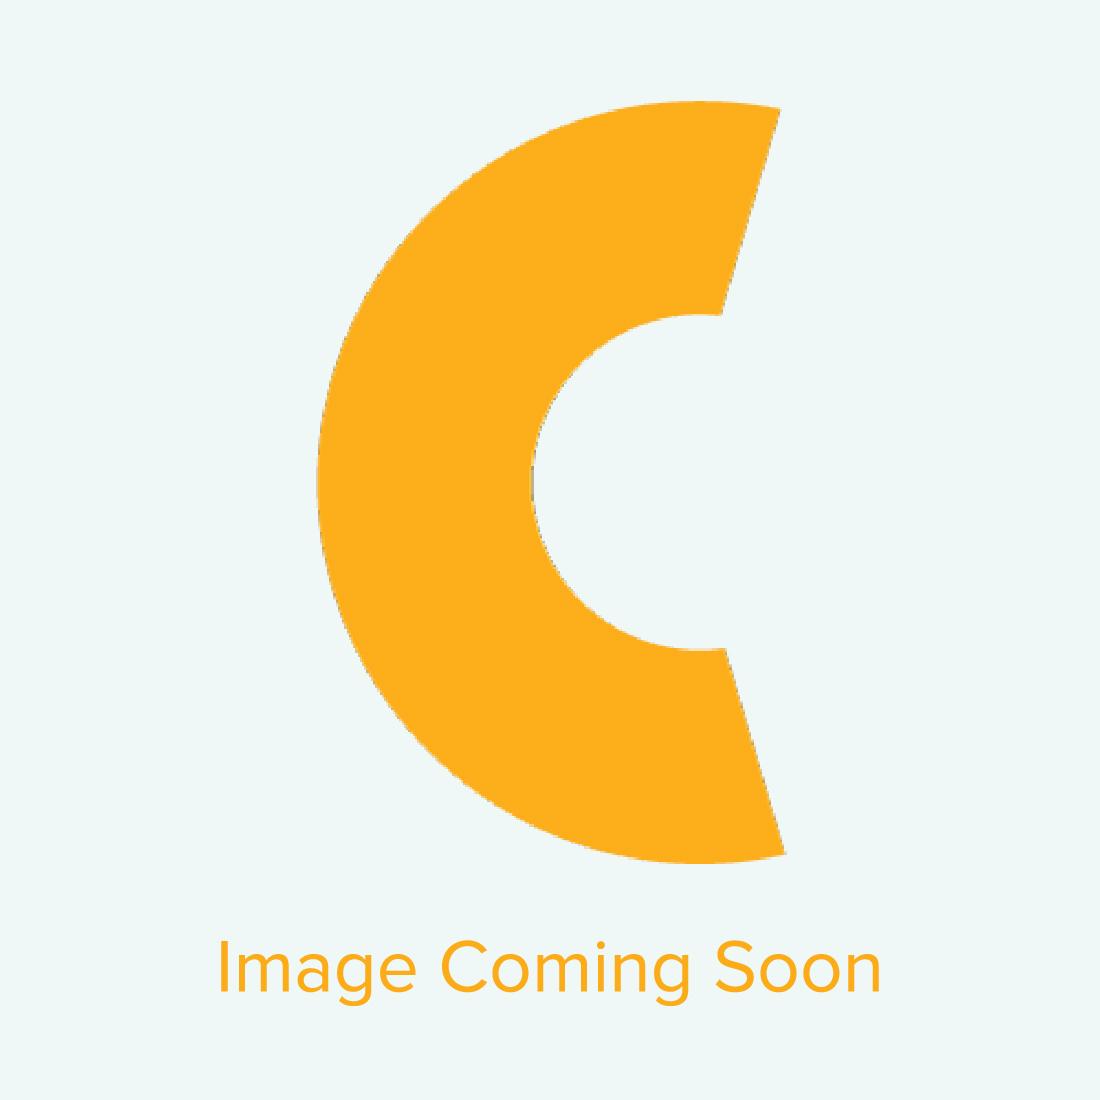 "Siser EasyPatterns Heat Transfer  - 18"" x 10yds - Argyle Maroon"